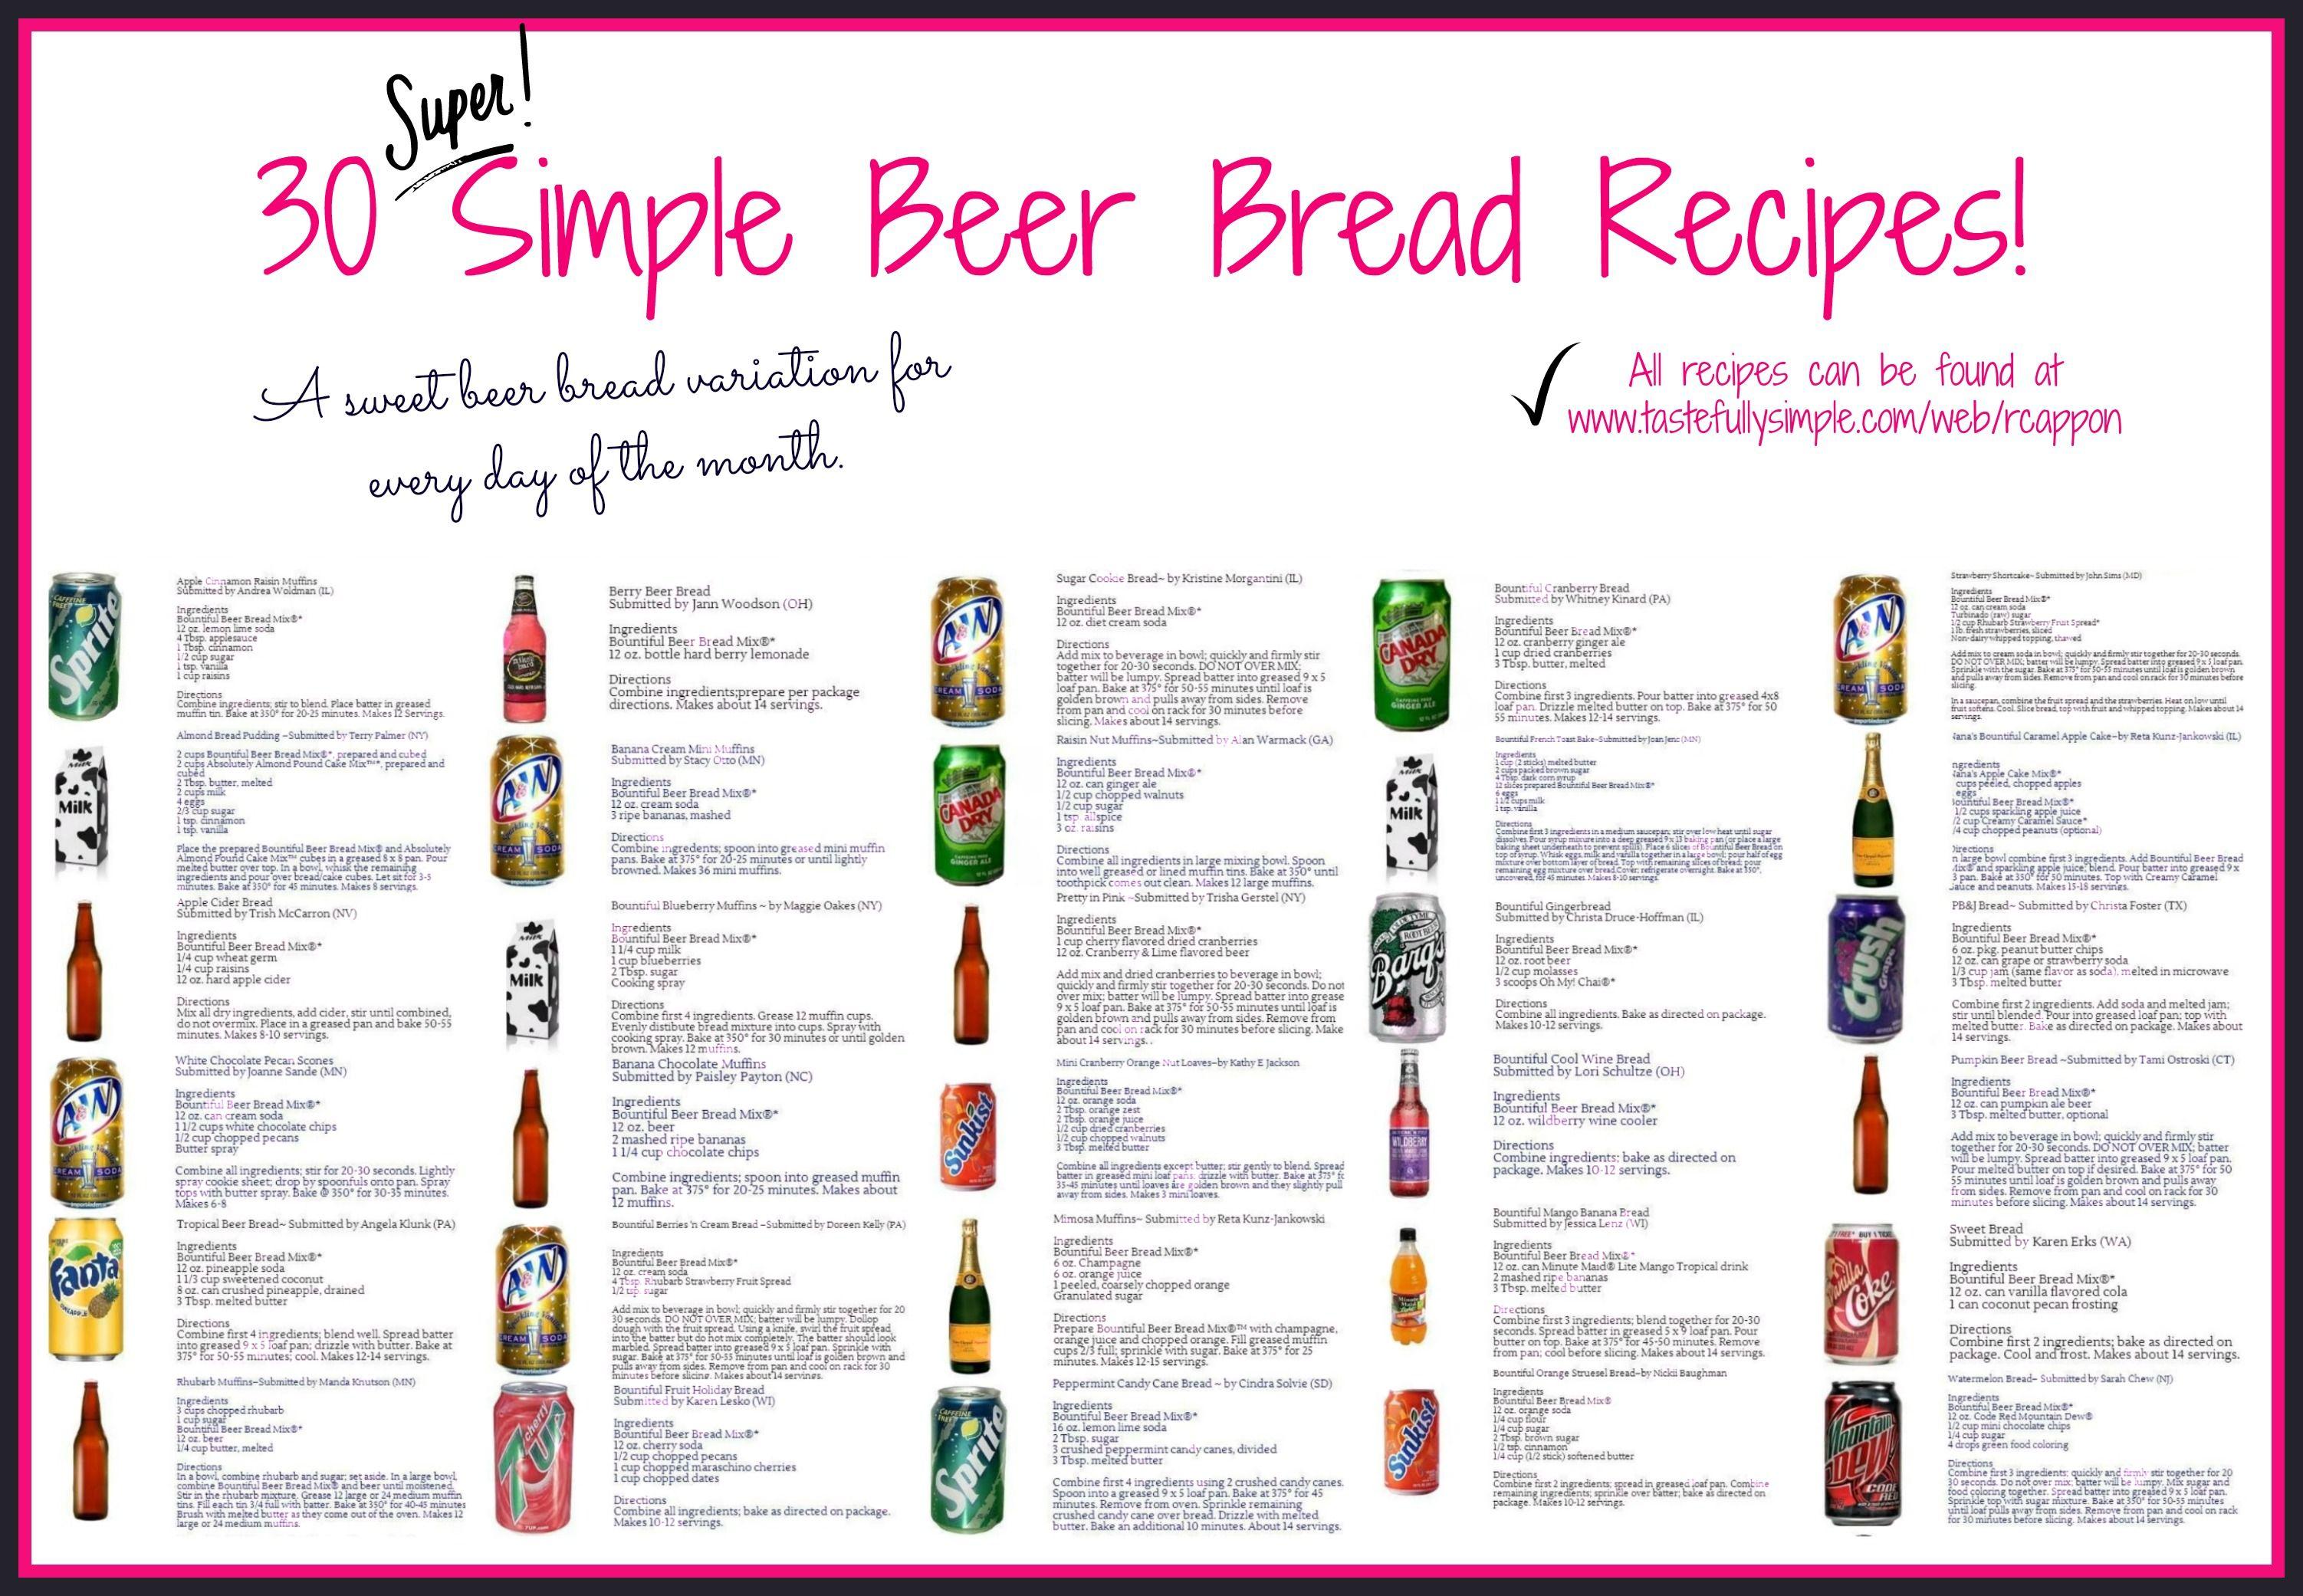 Breads Muffins Tastefully Simple Tastefully Simple Recipes Beer Bread Tastefully Simple Consultant